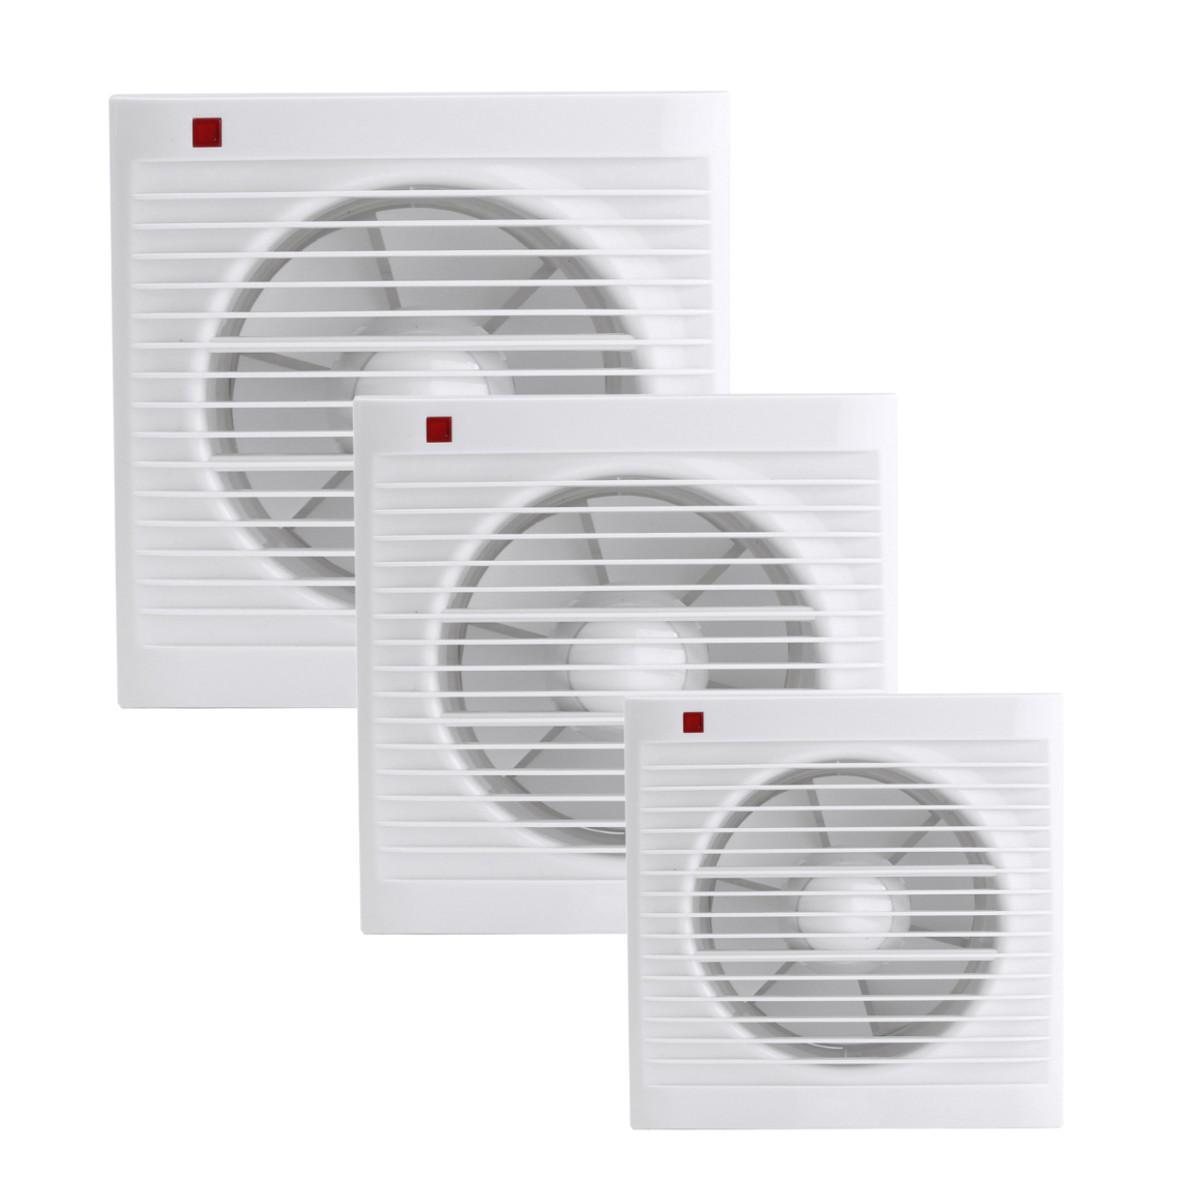 4 6 8 Waterproof Mute Bathroom Extractor Exhaust Fan Window For Kitchen Toilet Ventilation Fans in size 1200 X 1200